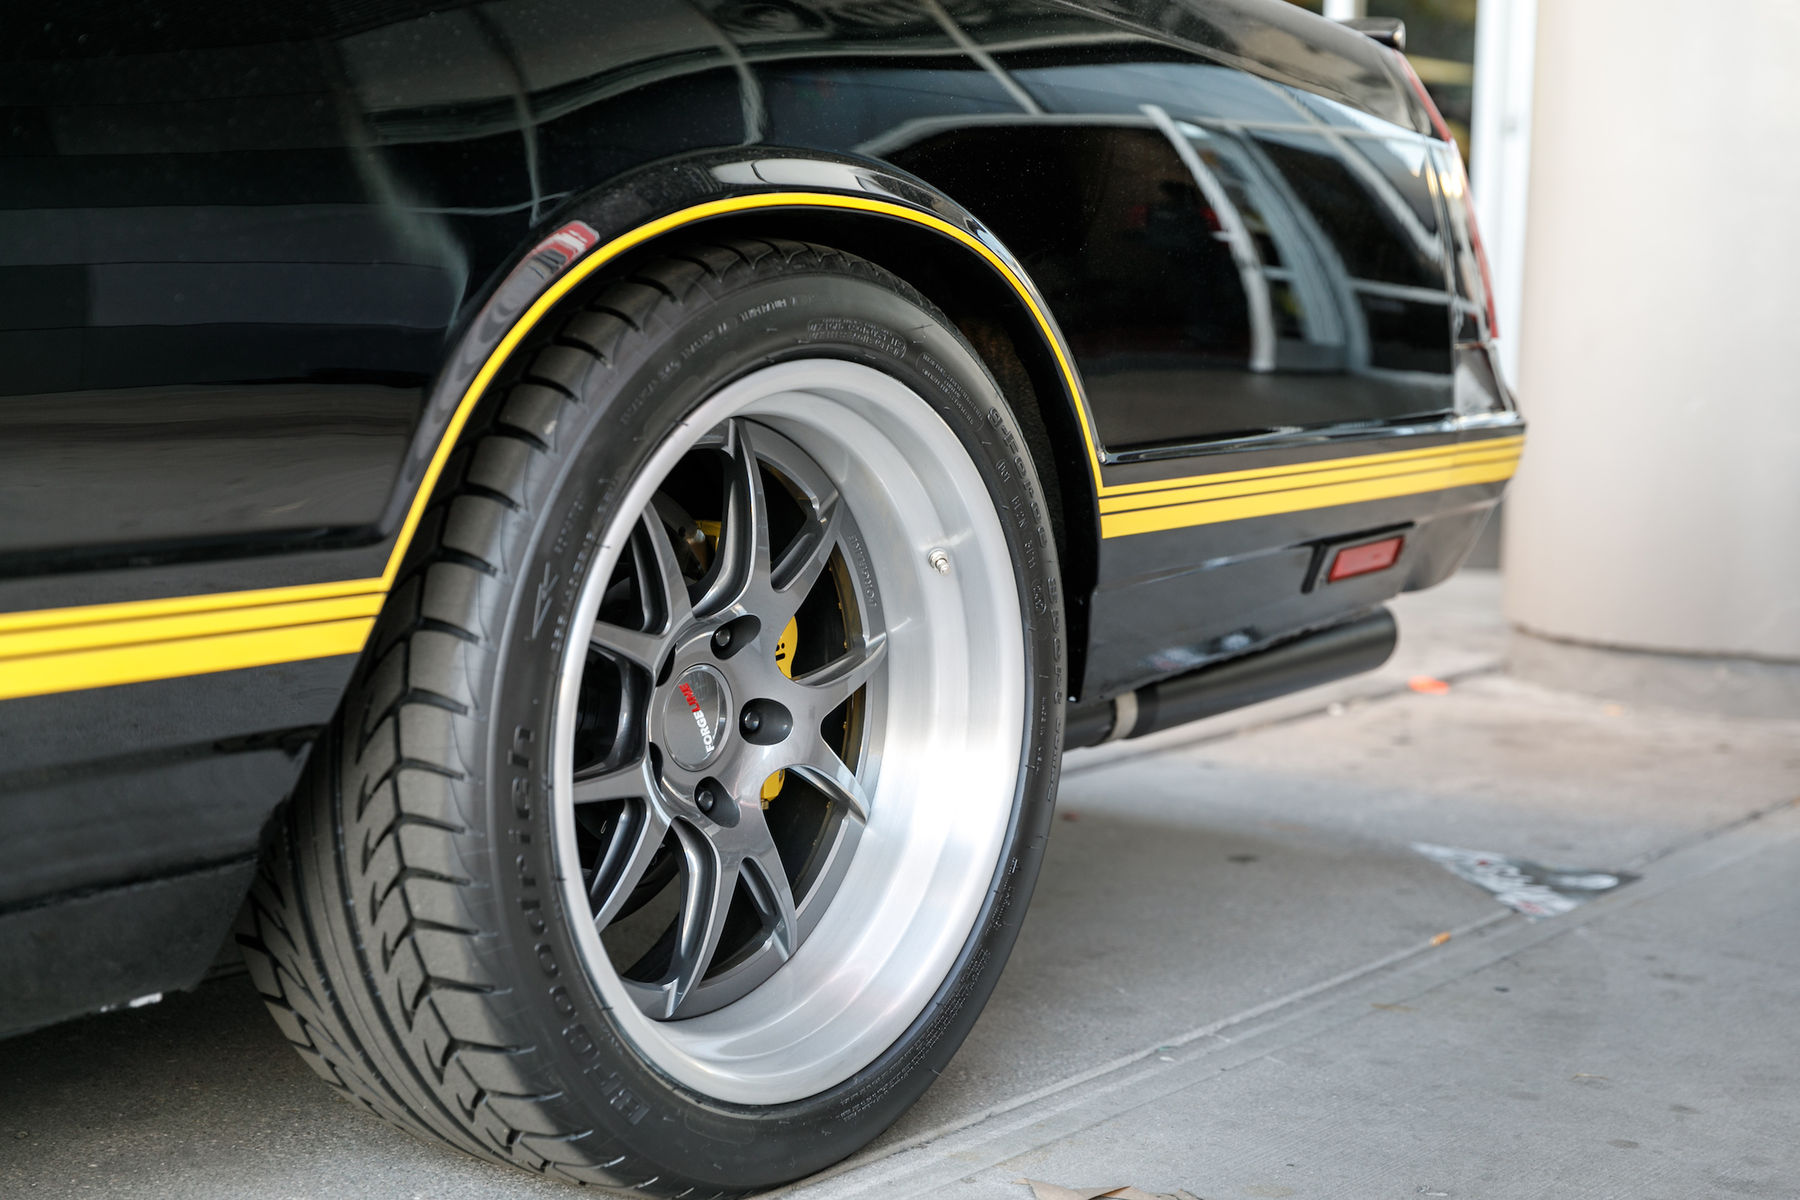 1987 Chevrolet Monte Carlo | Barrett-Jackson's